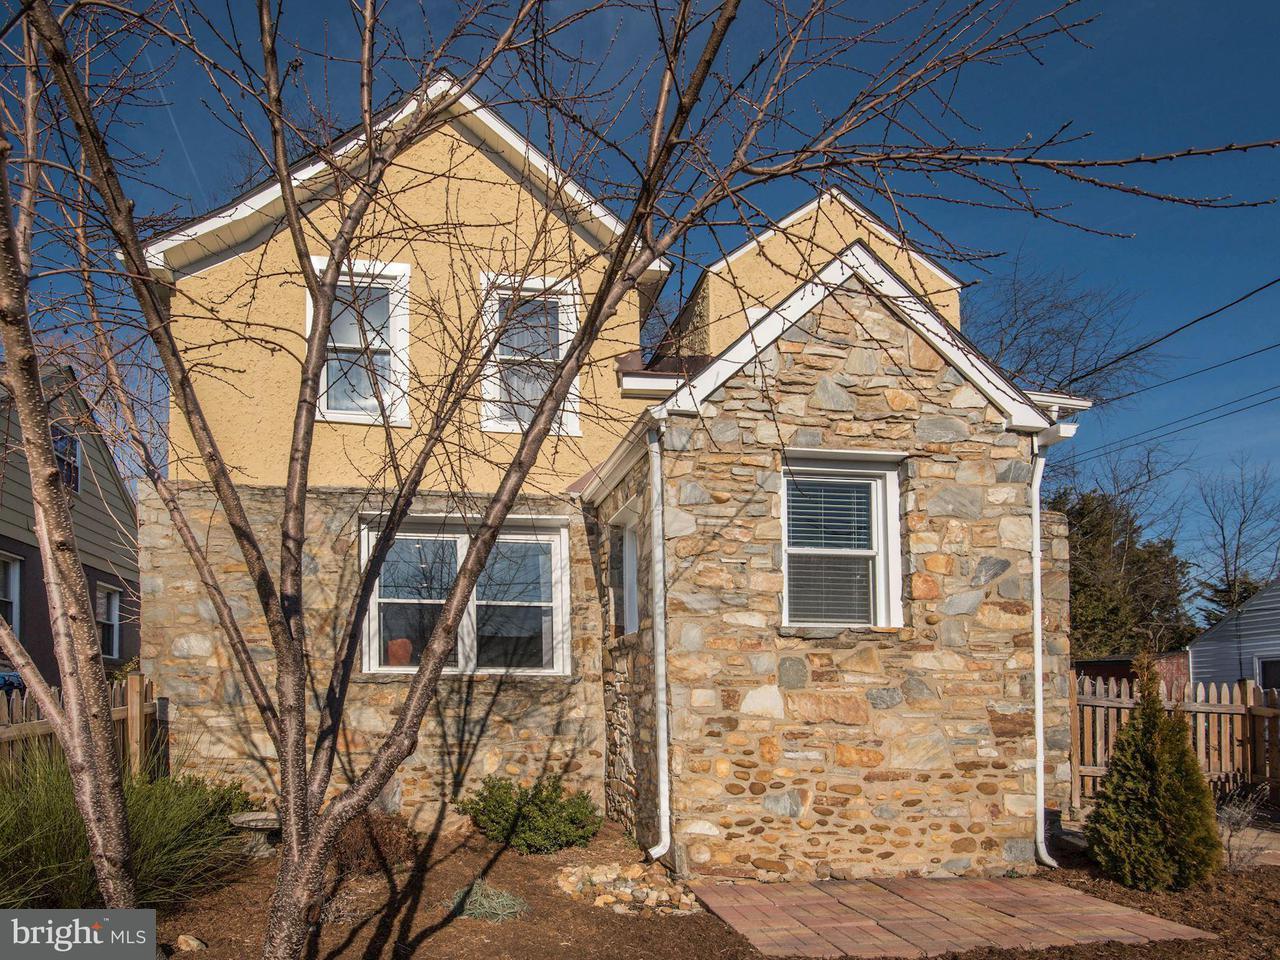 Single Family Home for Sale at 1809 Culpeper Street 1809 Culpeper Street Arlington, Virginia 22207 United States